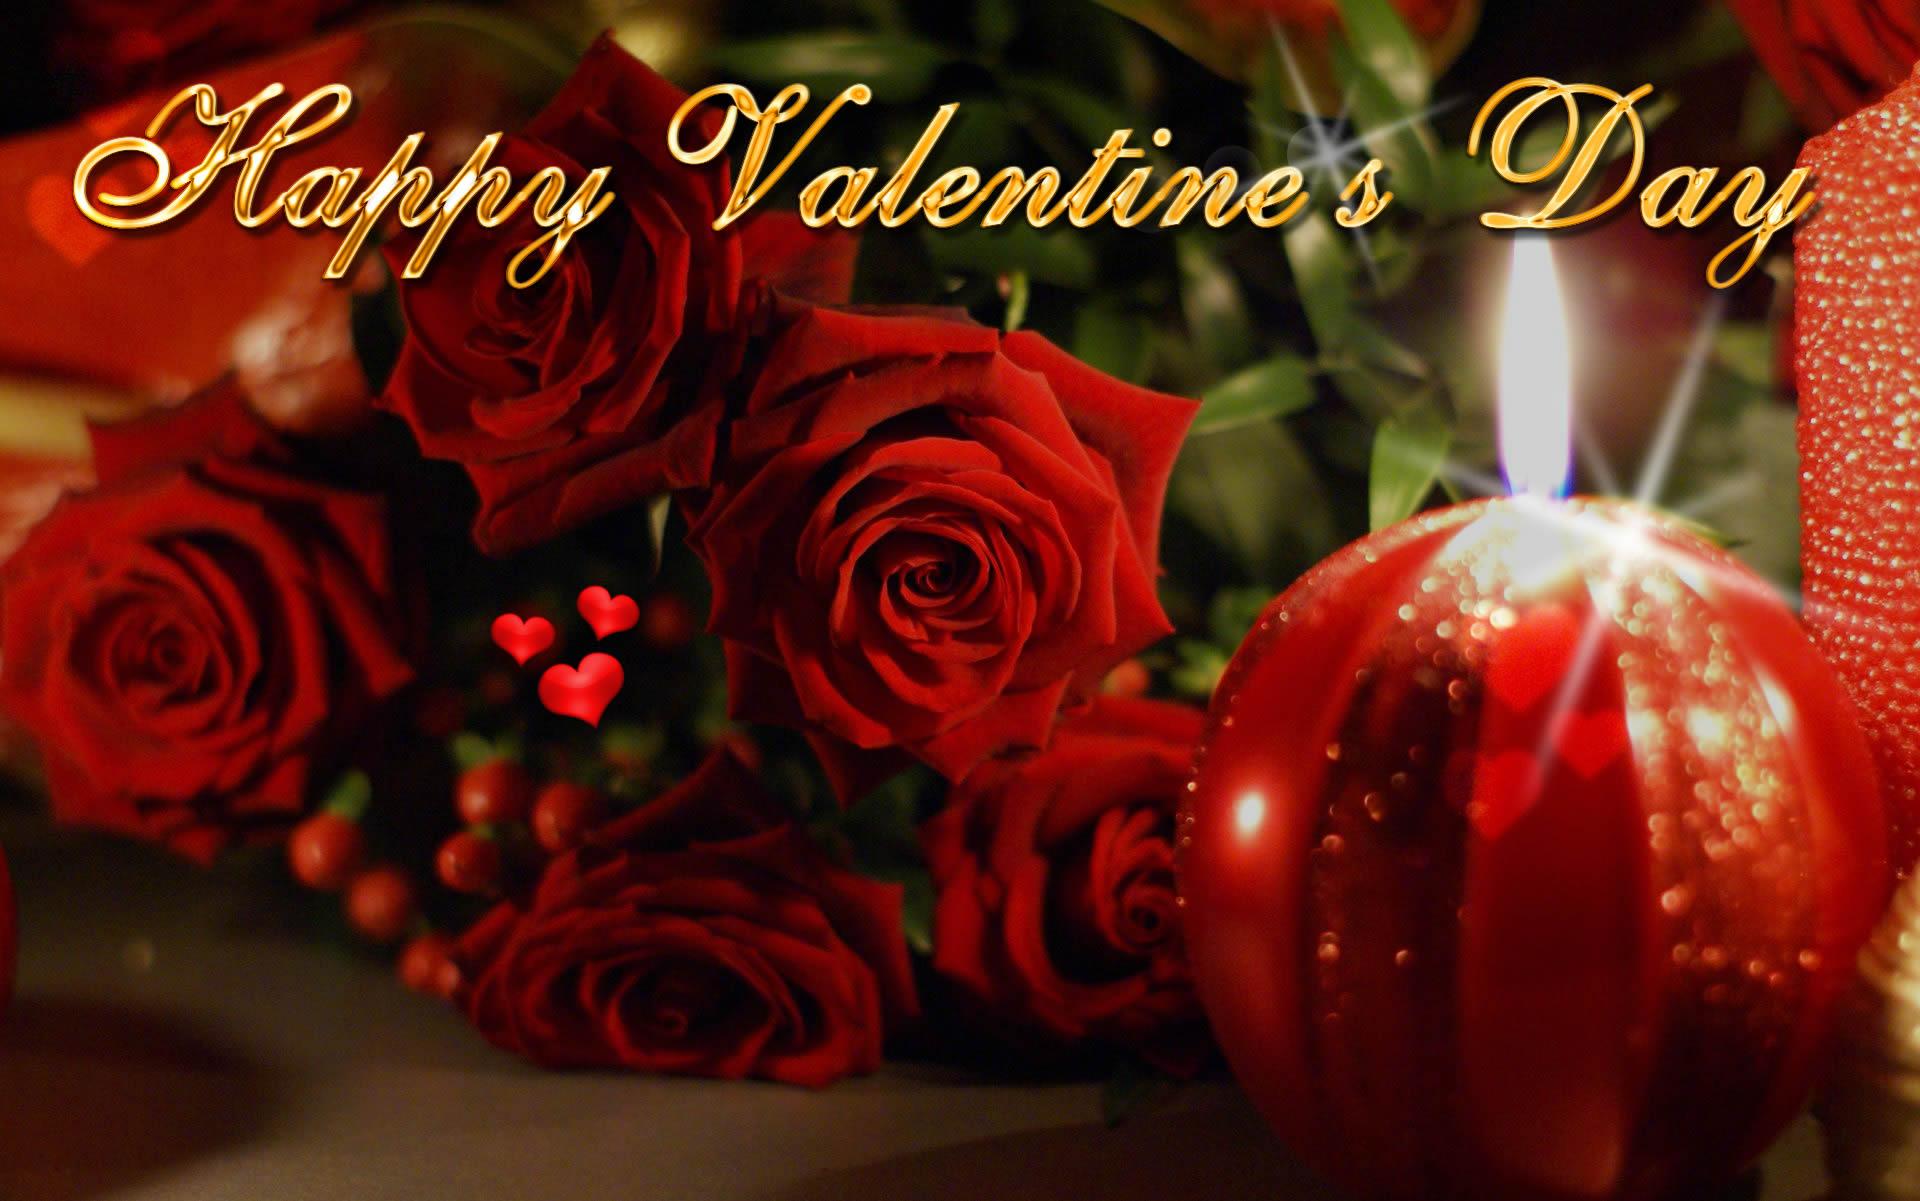 Happy Valentineu0027s Day 2016 Whatsapp Status And Facebook Messages U2013 Whatsapp  Lover